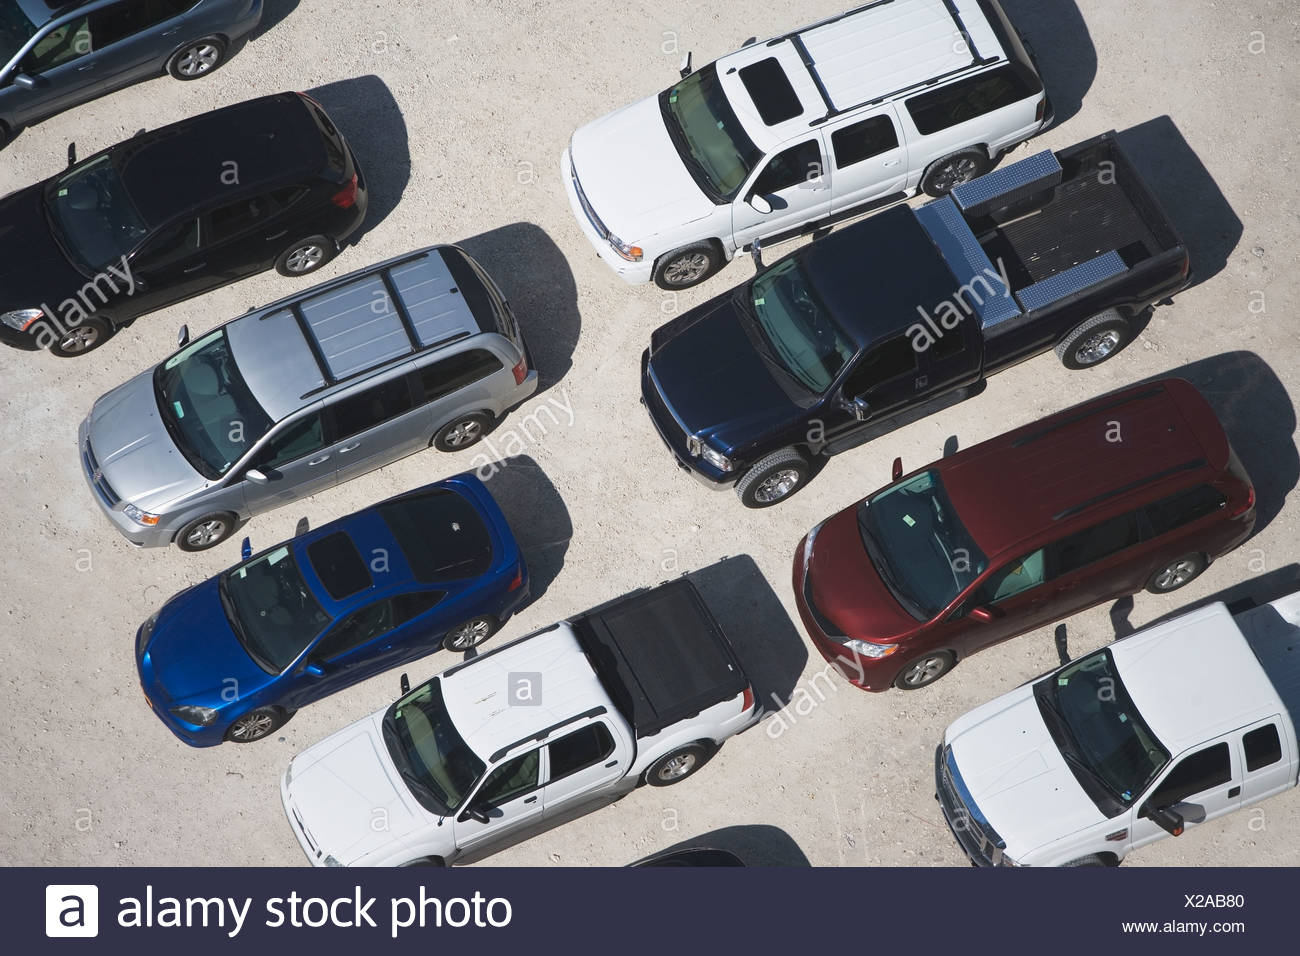 USA, Florida, Miami, Aerial view of car park - Stock Image